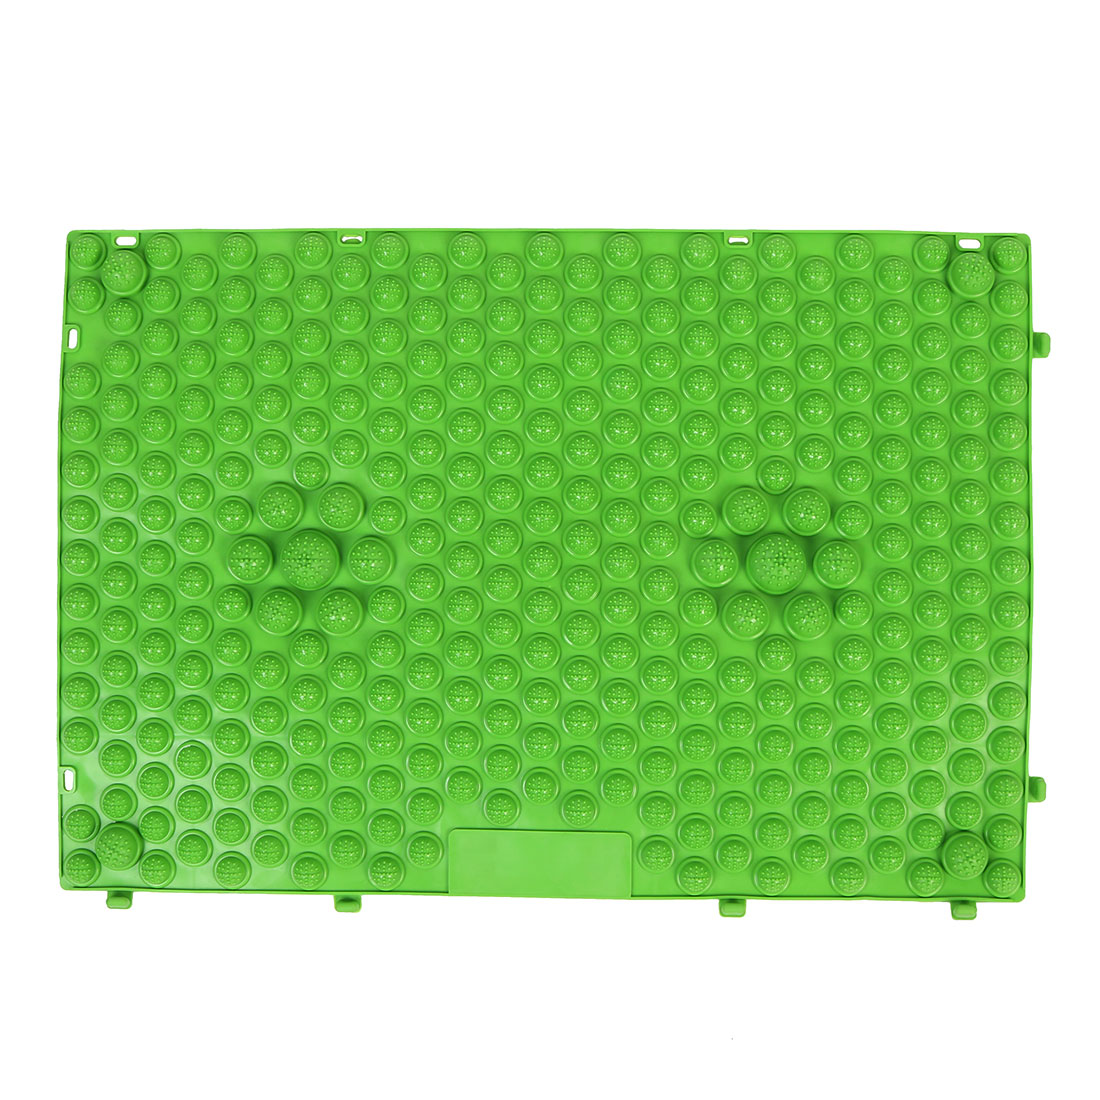 Outdoor Leisure Game Rubber Acupuncture Foot Massage Mat Shiatsu Sheet Green